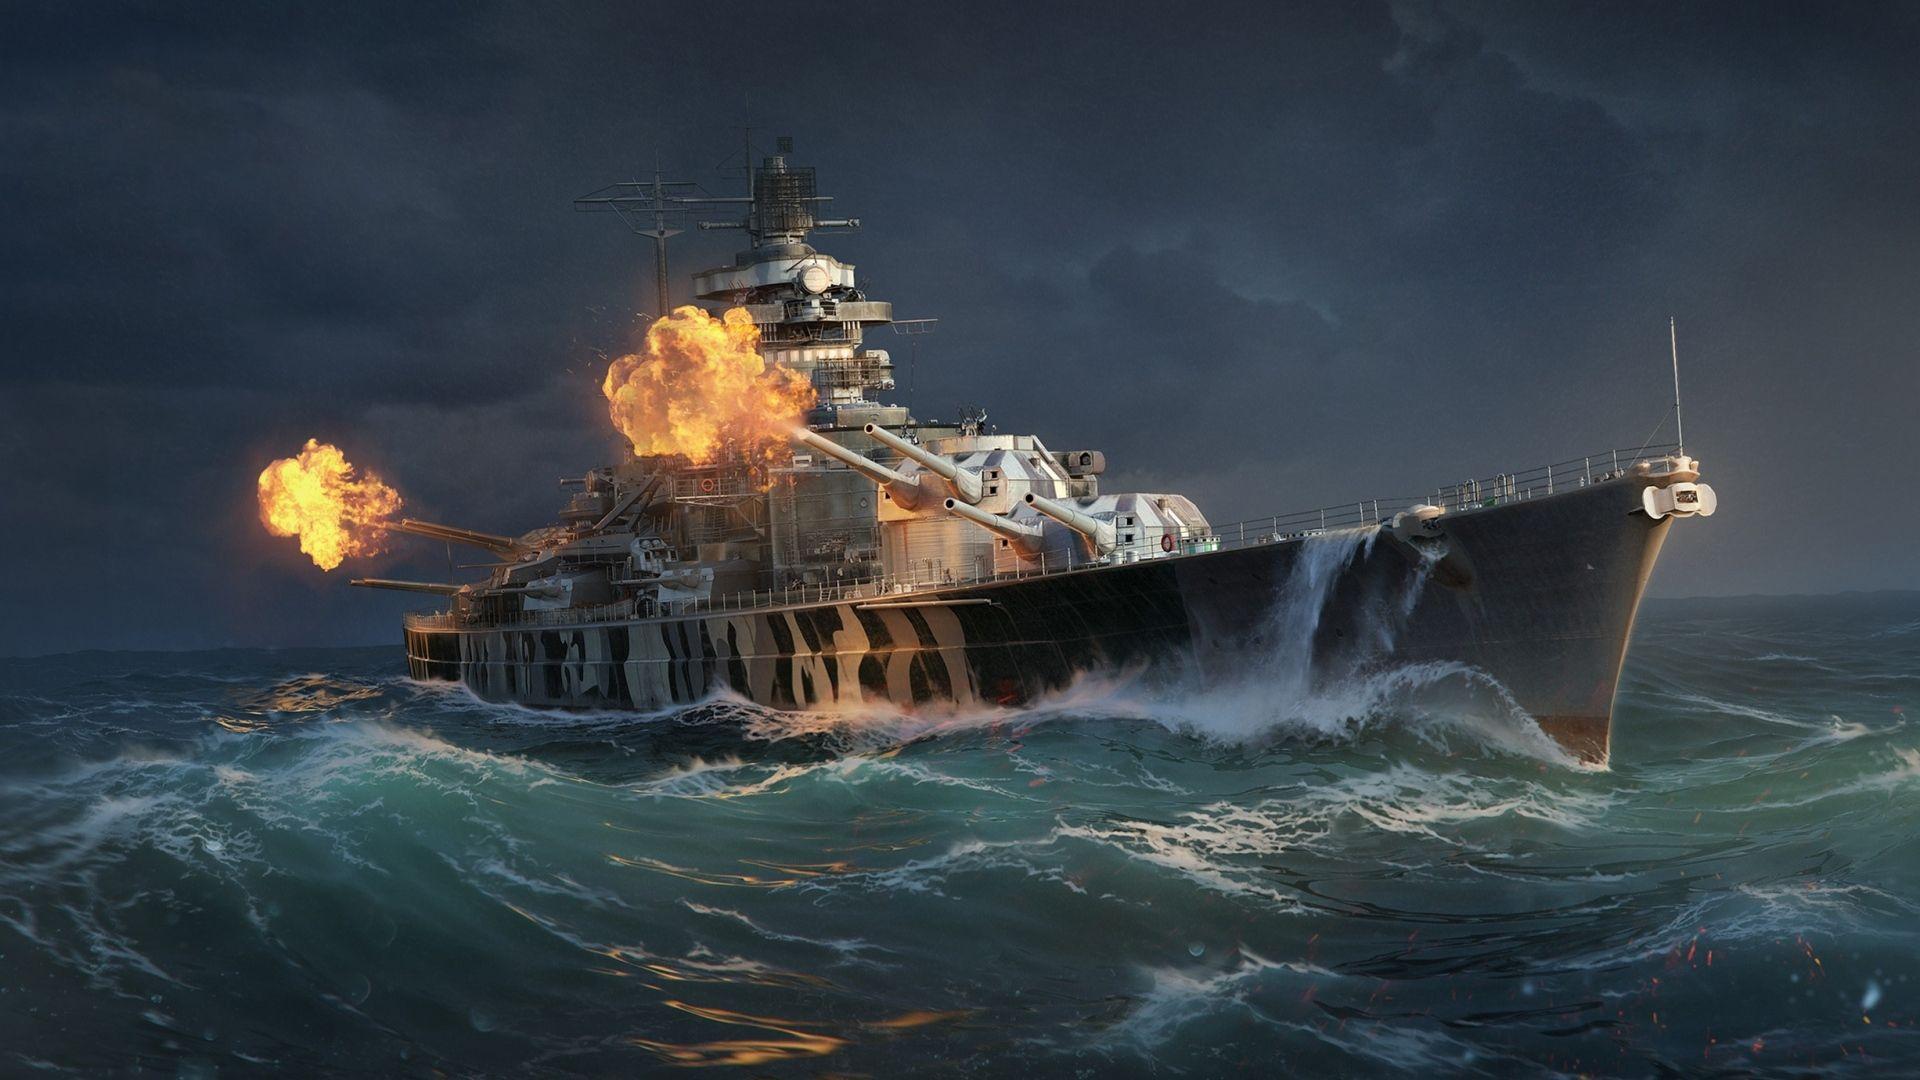 full hd 1080p world of warships wallpapers hd, desktop backgrounds